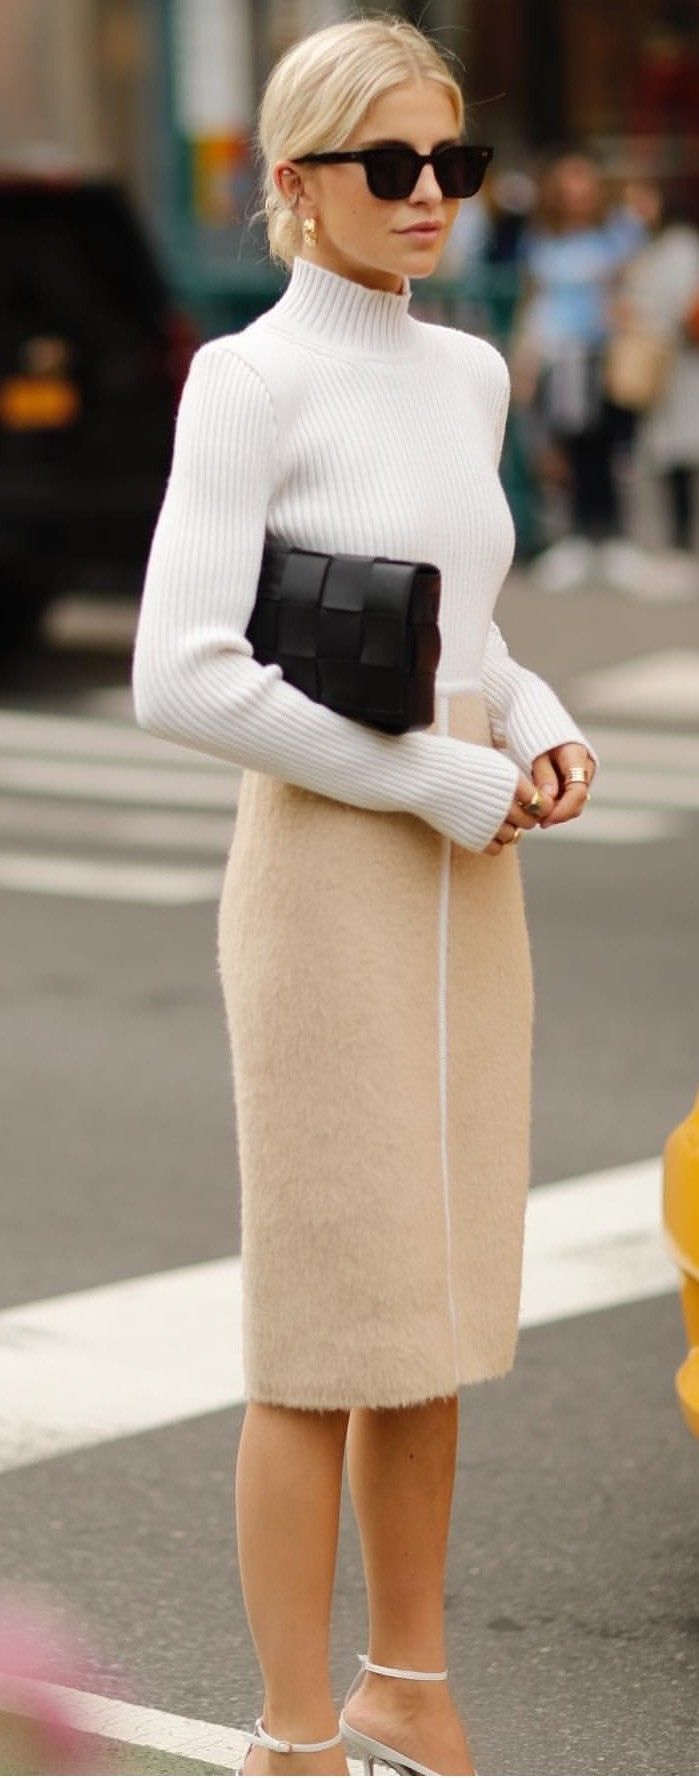 Pin do(a) Beatriz Bianchi em Fashion   Looks, Look e Roupas